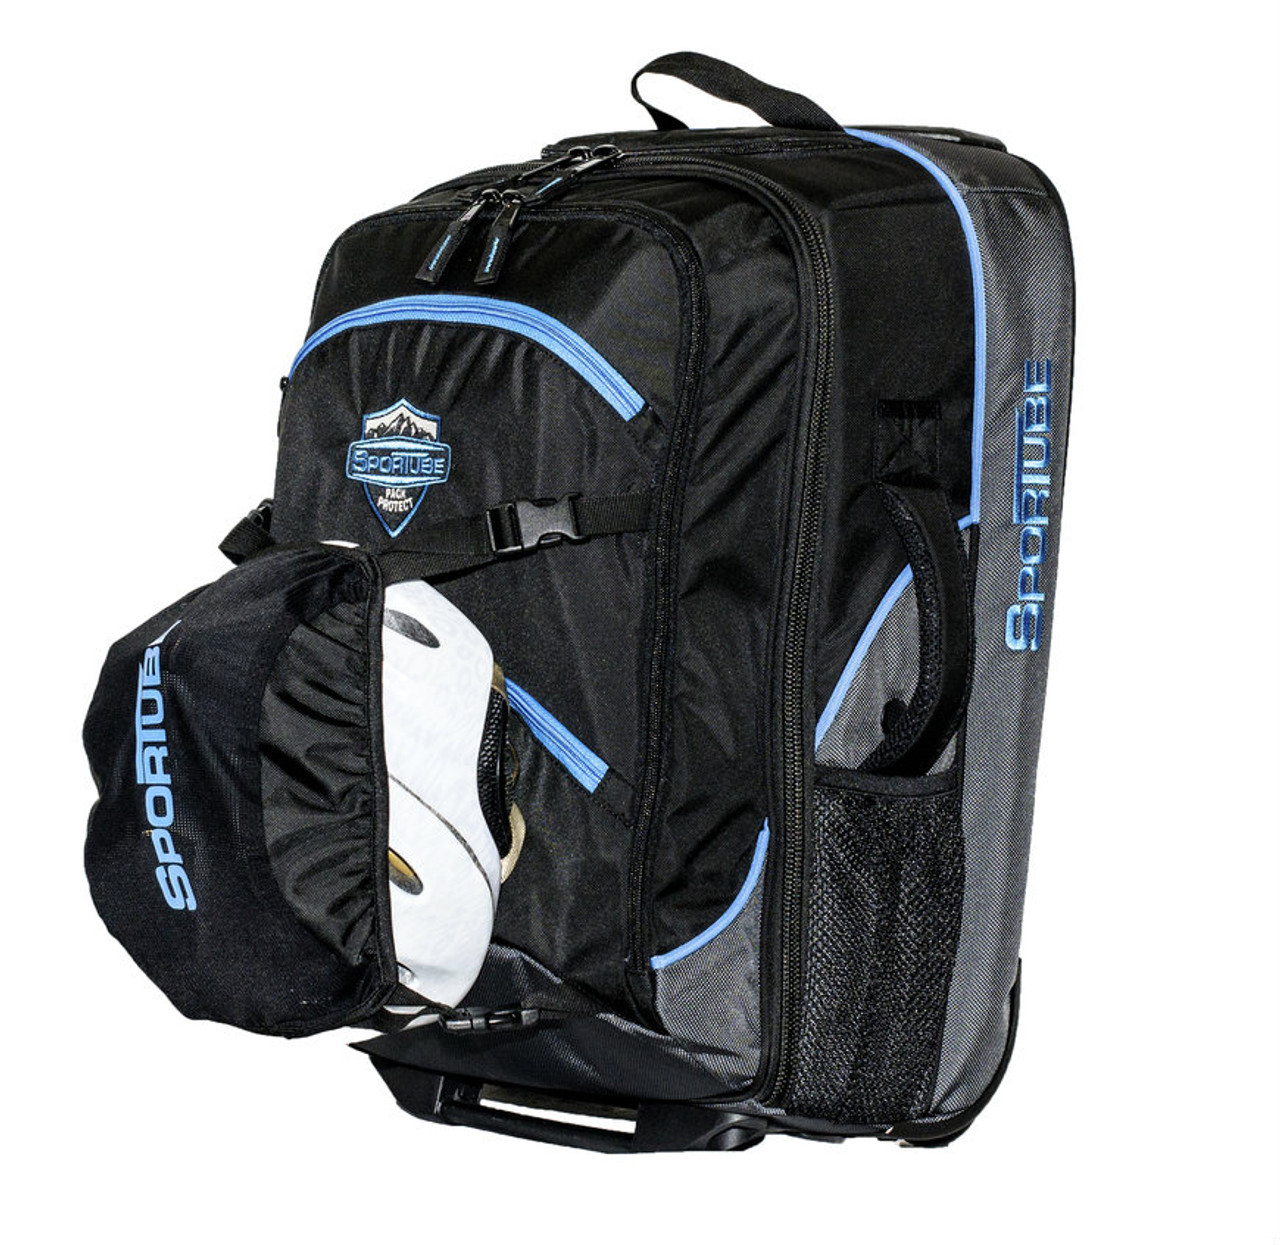 Ski Boot Bag >> Carry On Ski Boot Bag Pull Handle With Wheels Sportube